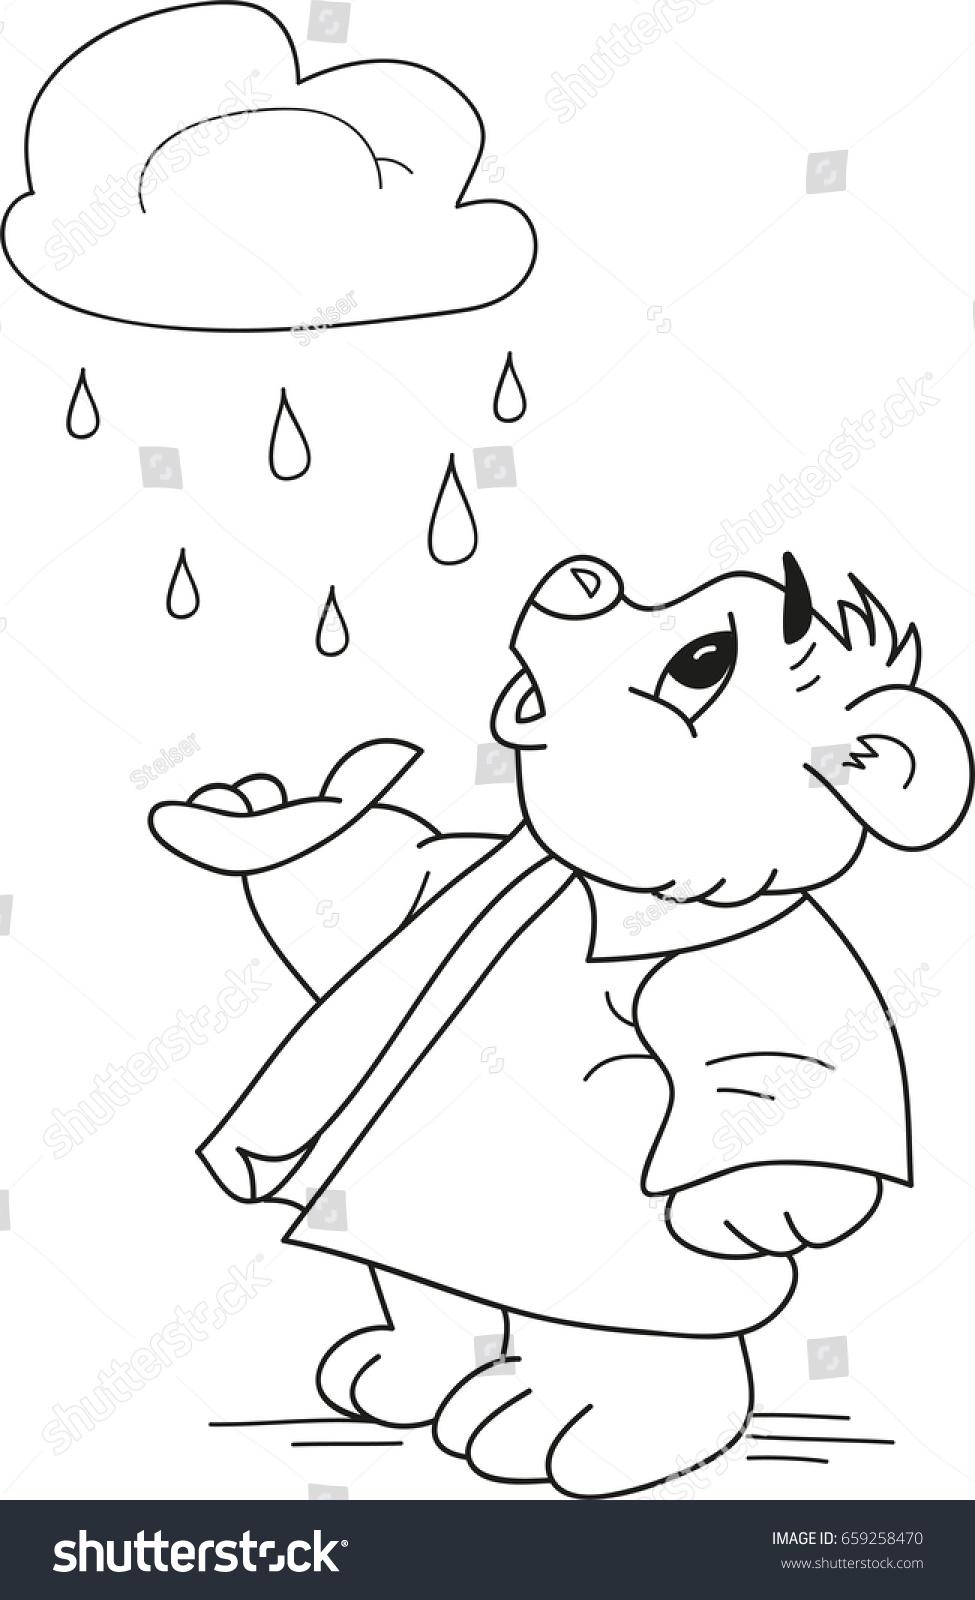 Rain Drops Coloring Book - Worksheet & Coloring Pages